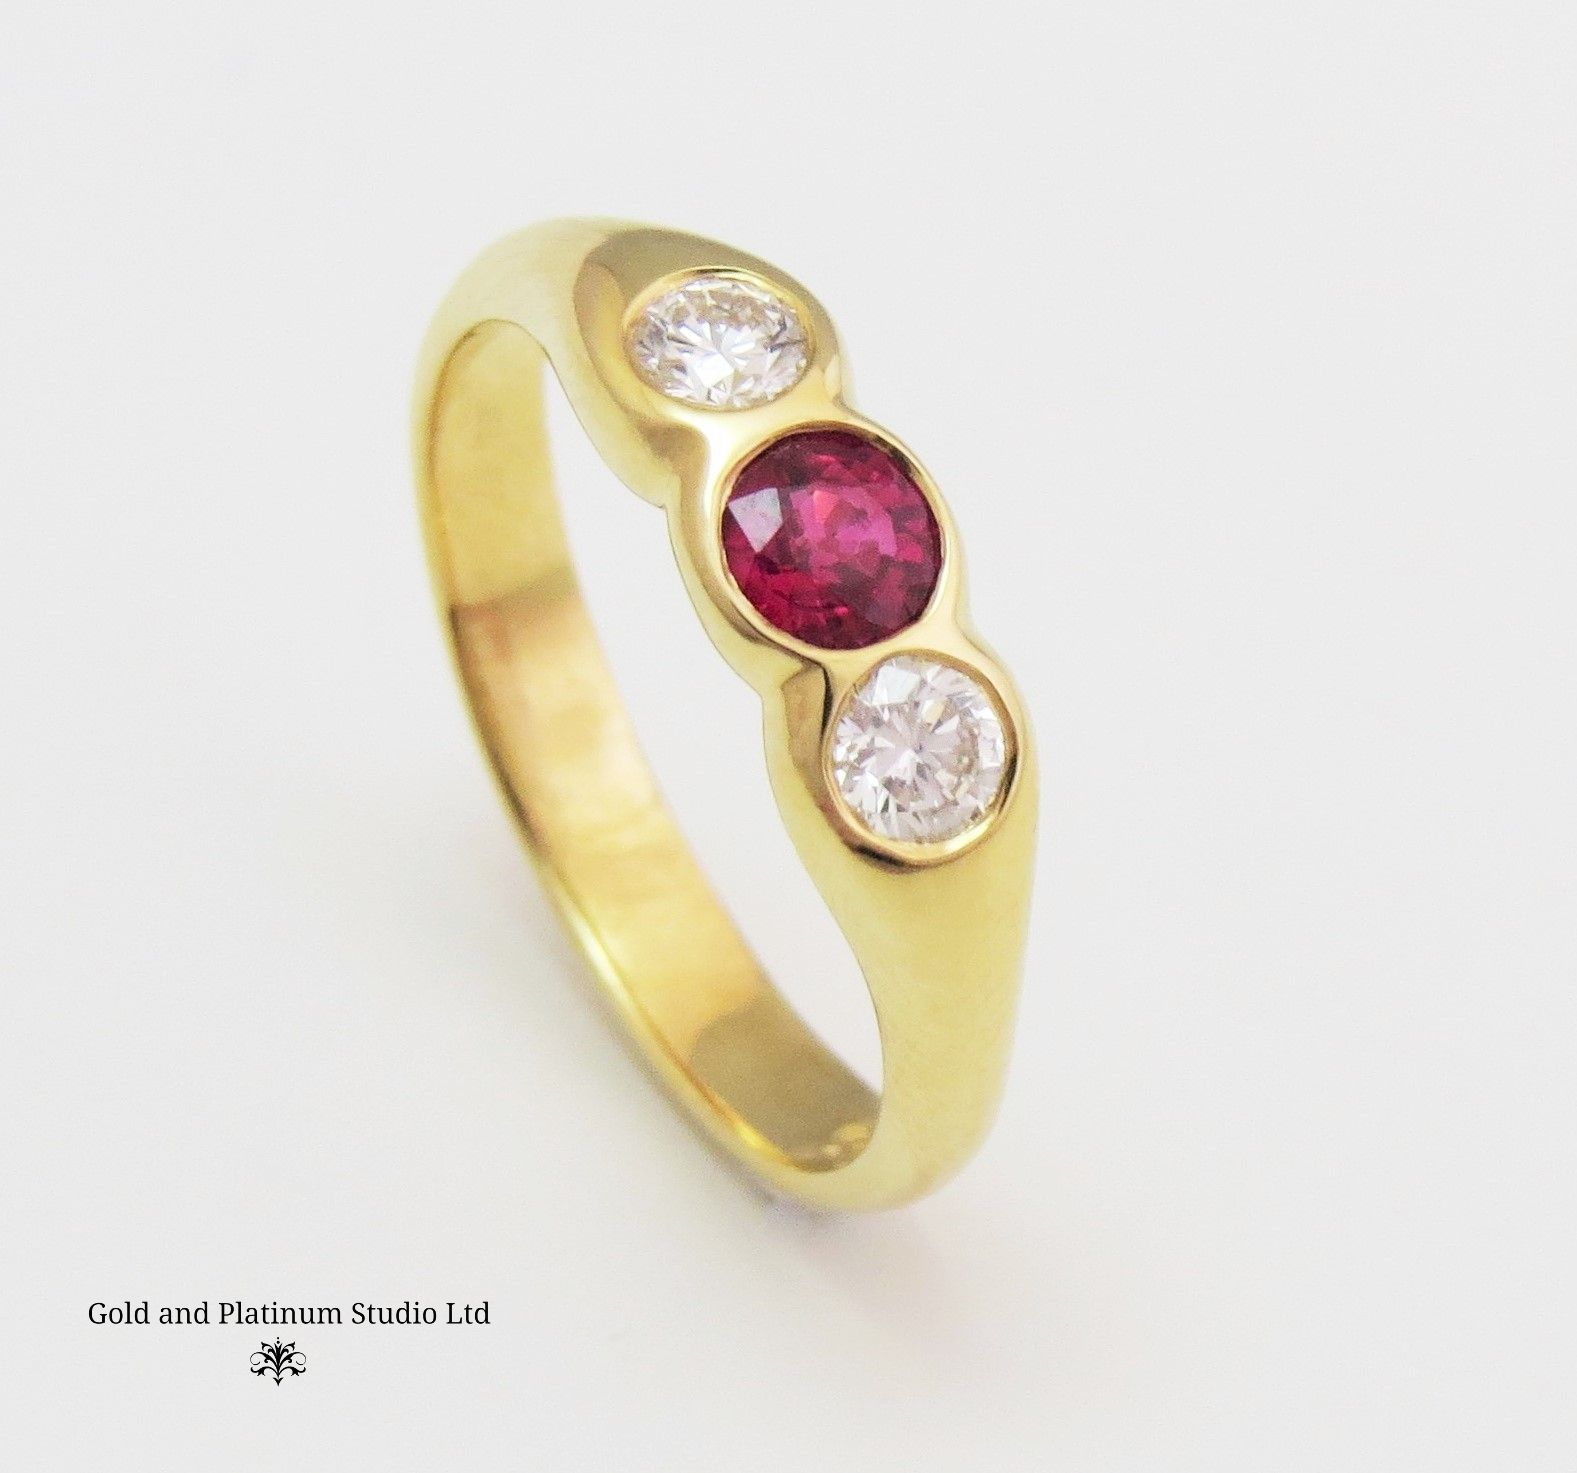 4ad45aa6e6fae 18ct yellow gold ruby and diamond three stone, rub over set ring ...